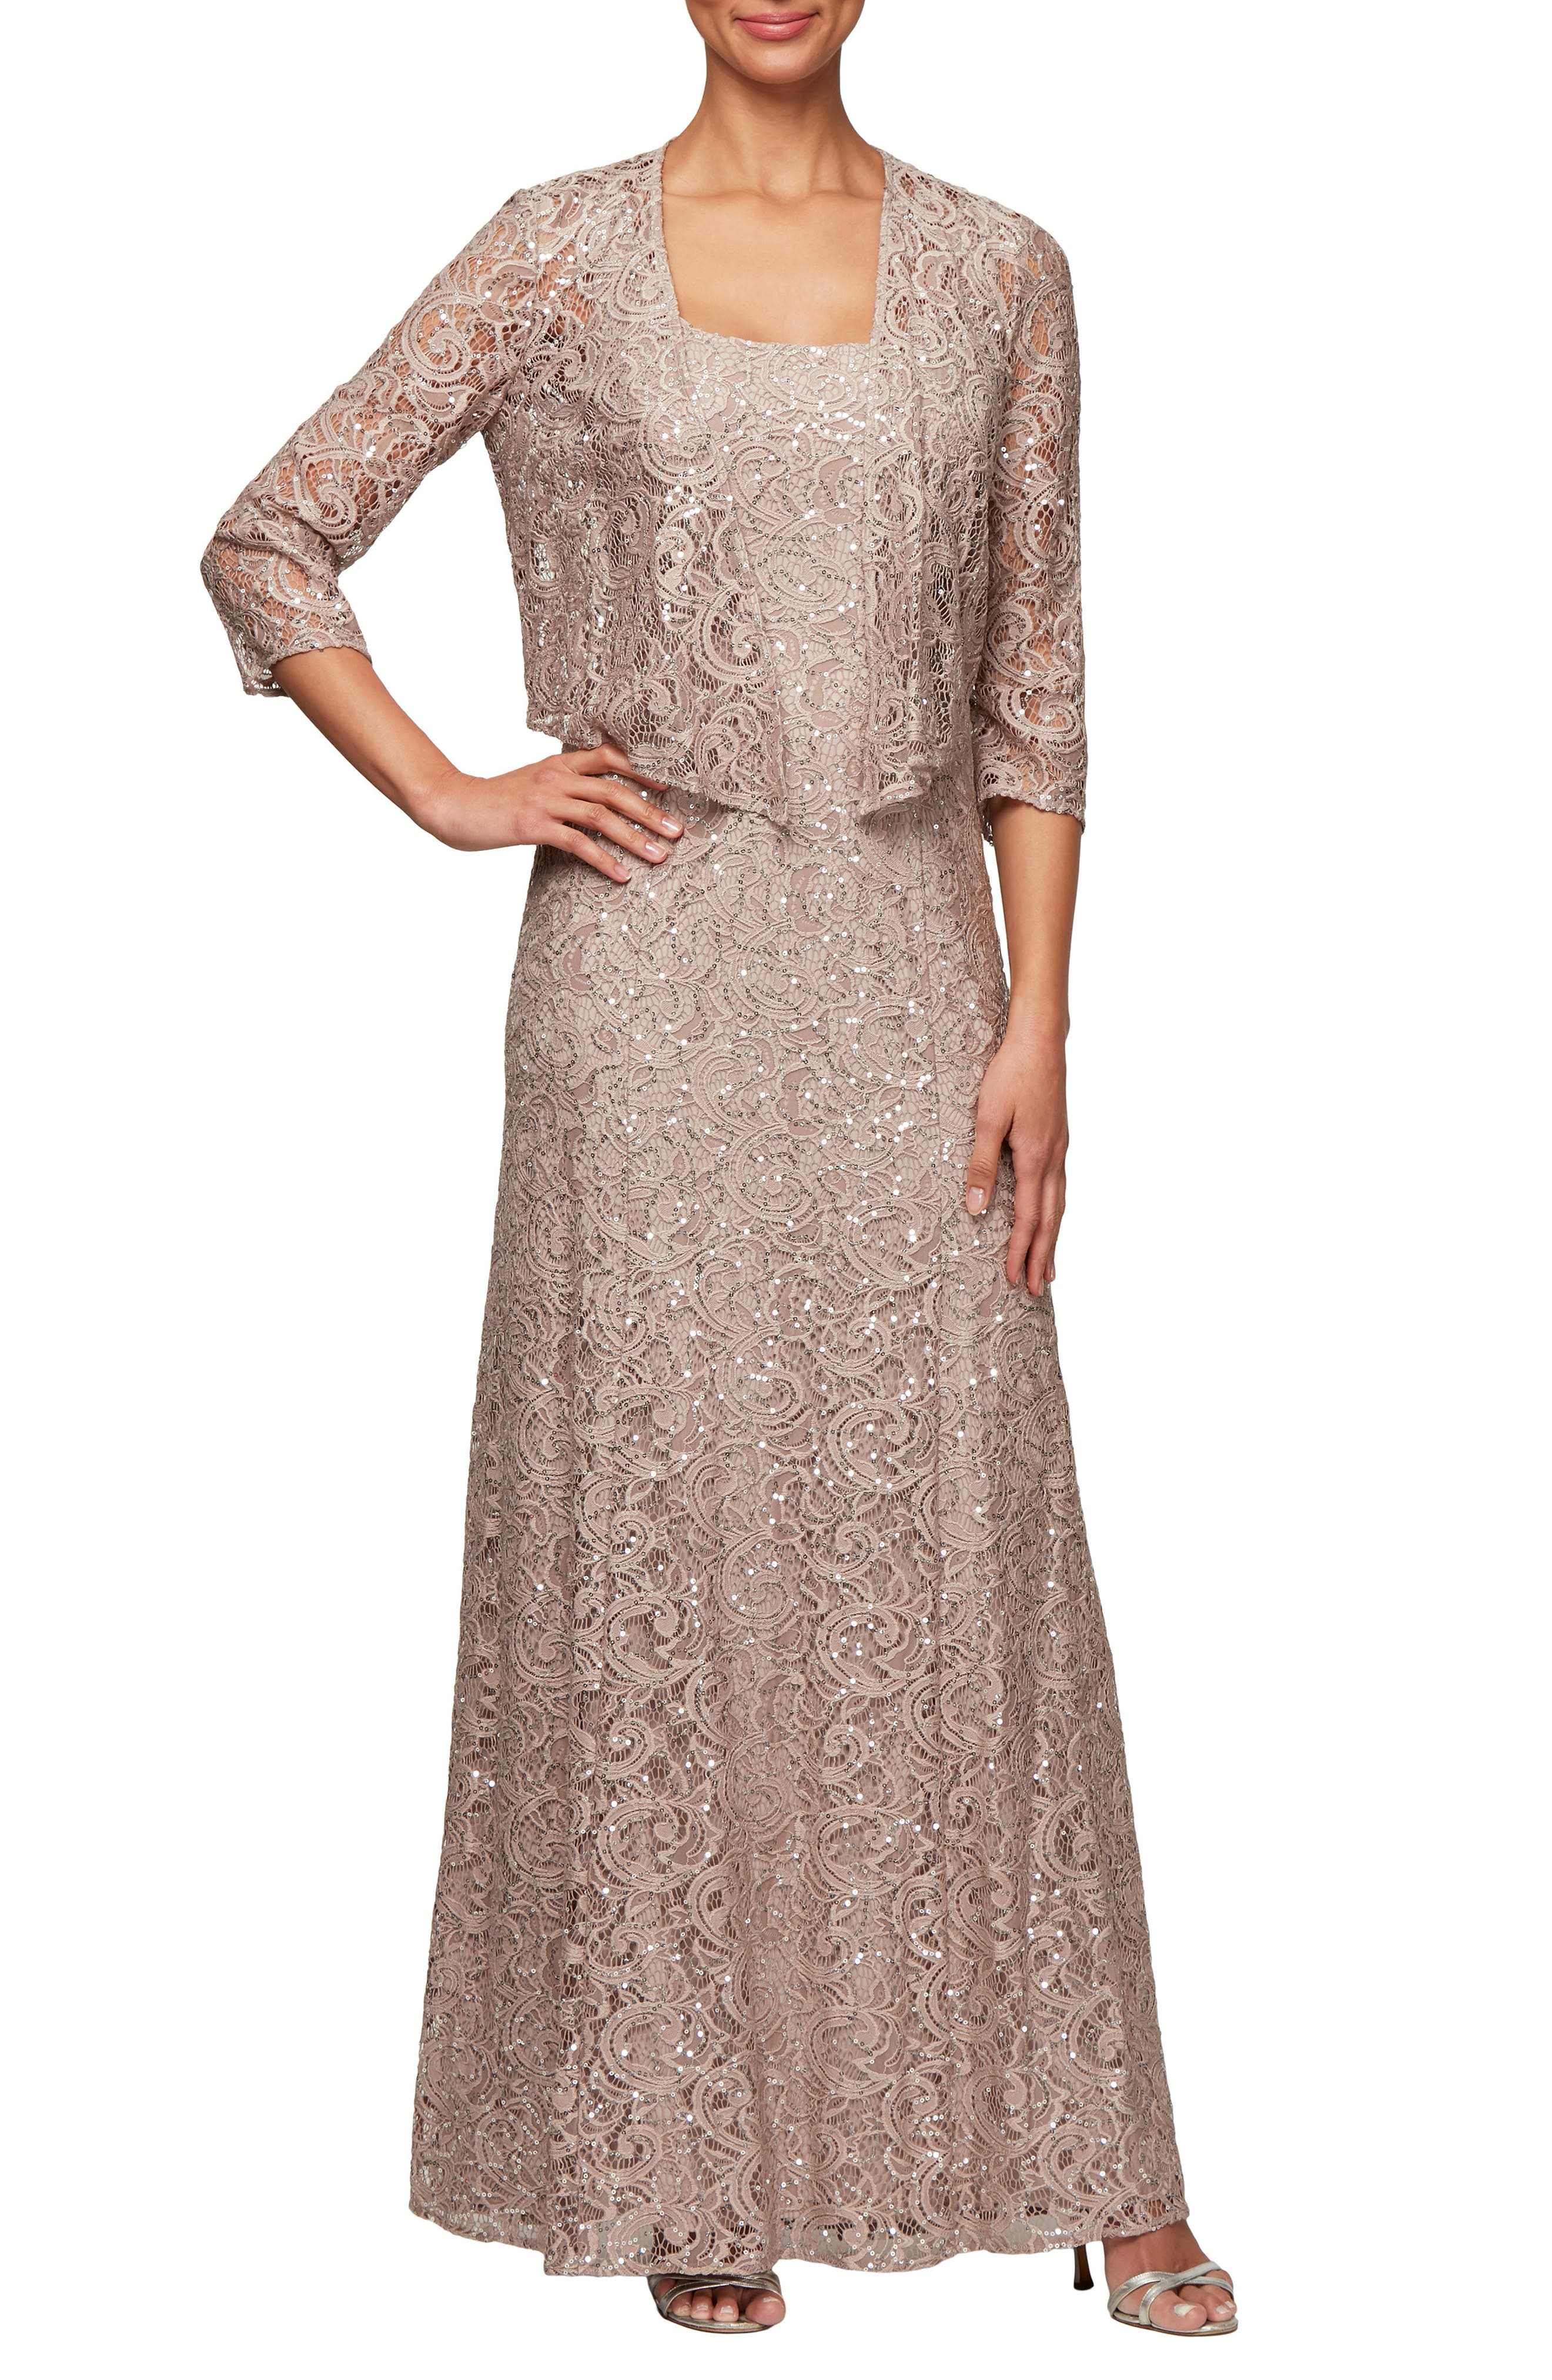 Sequin Lace Jacket Gown